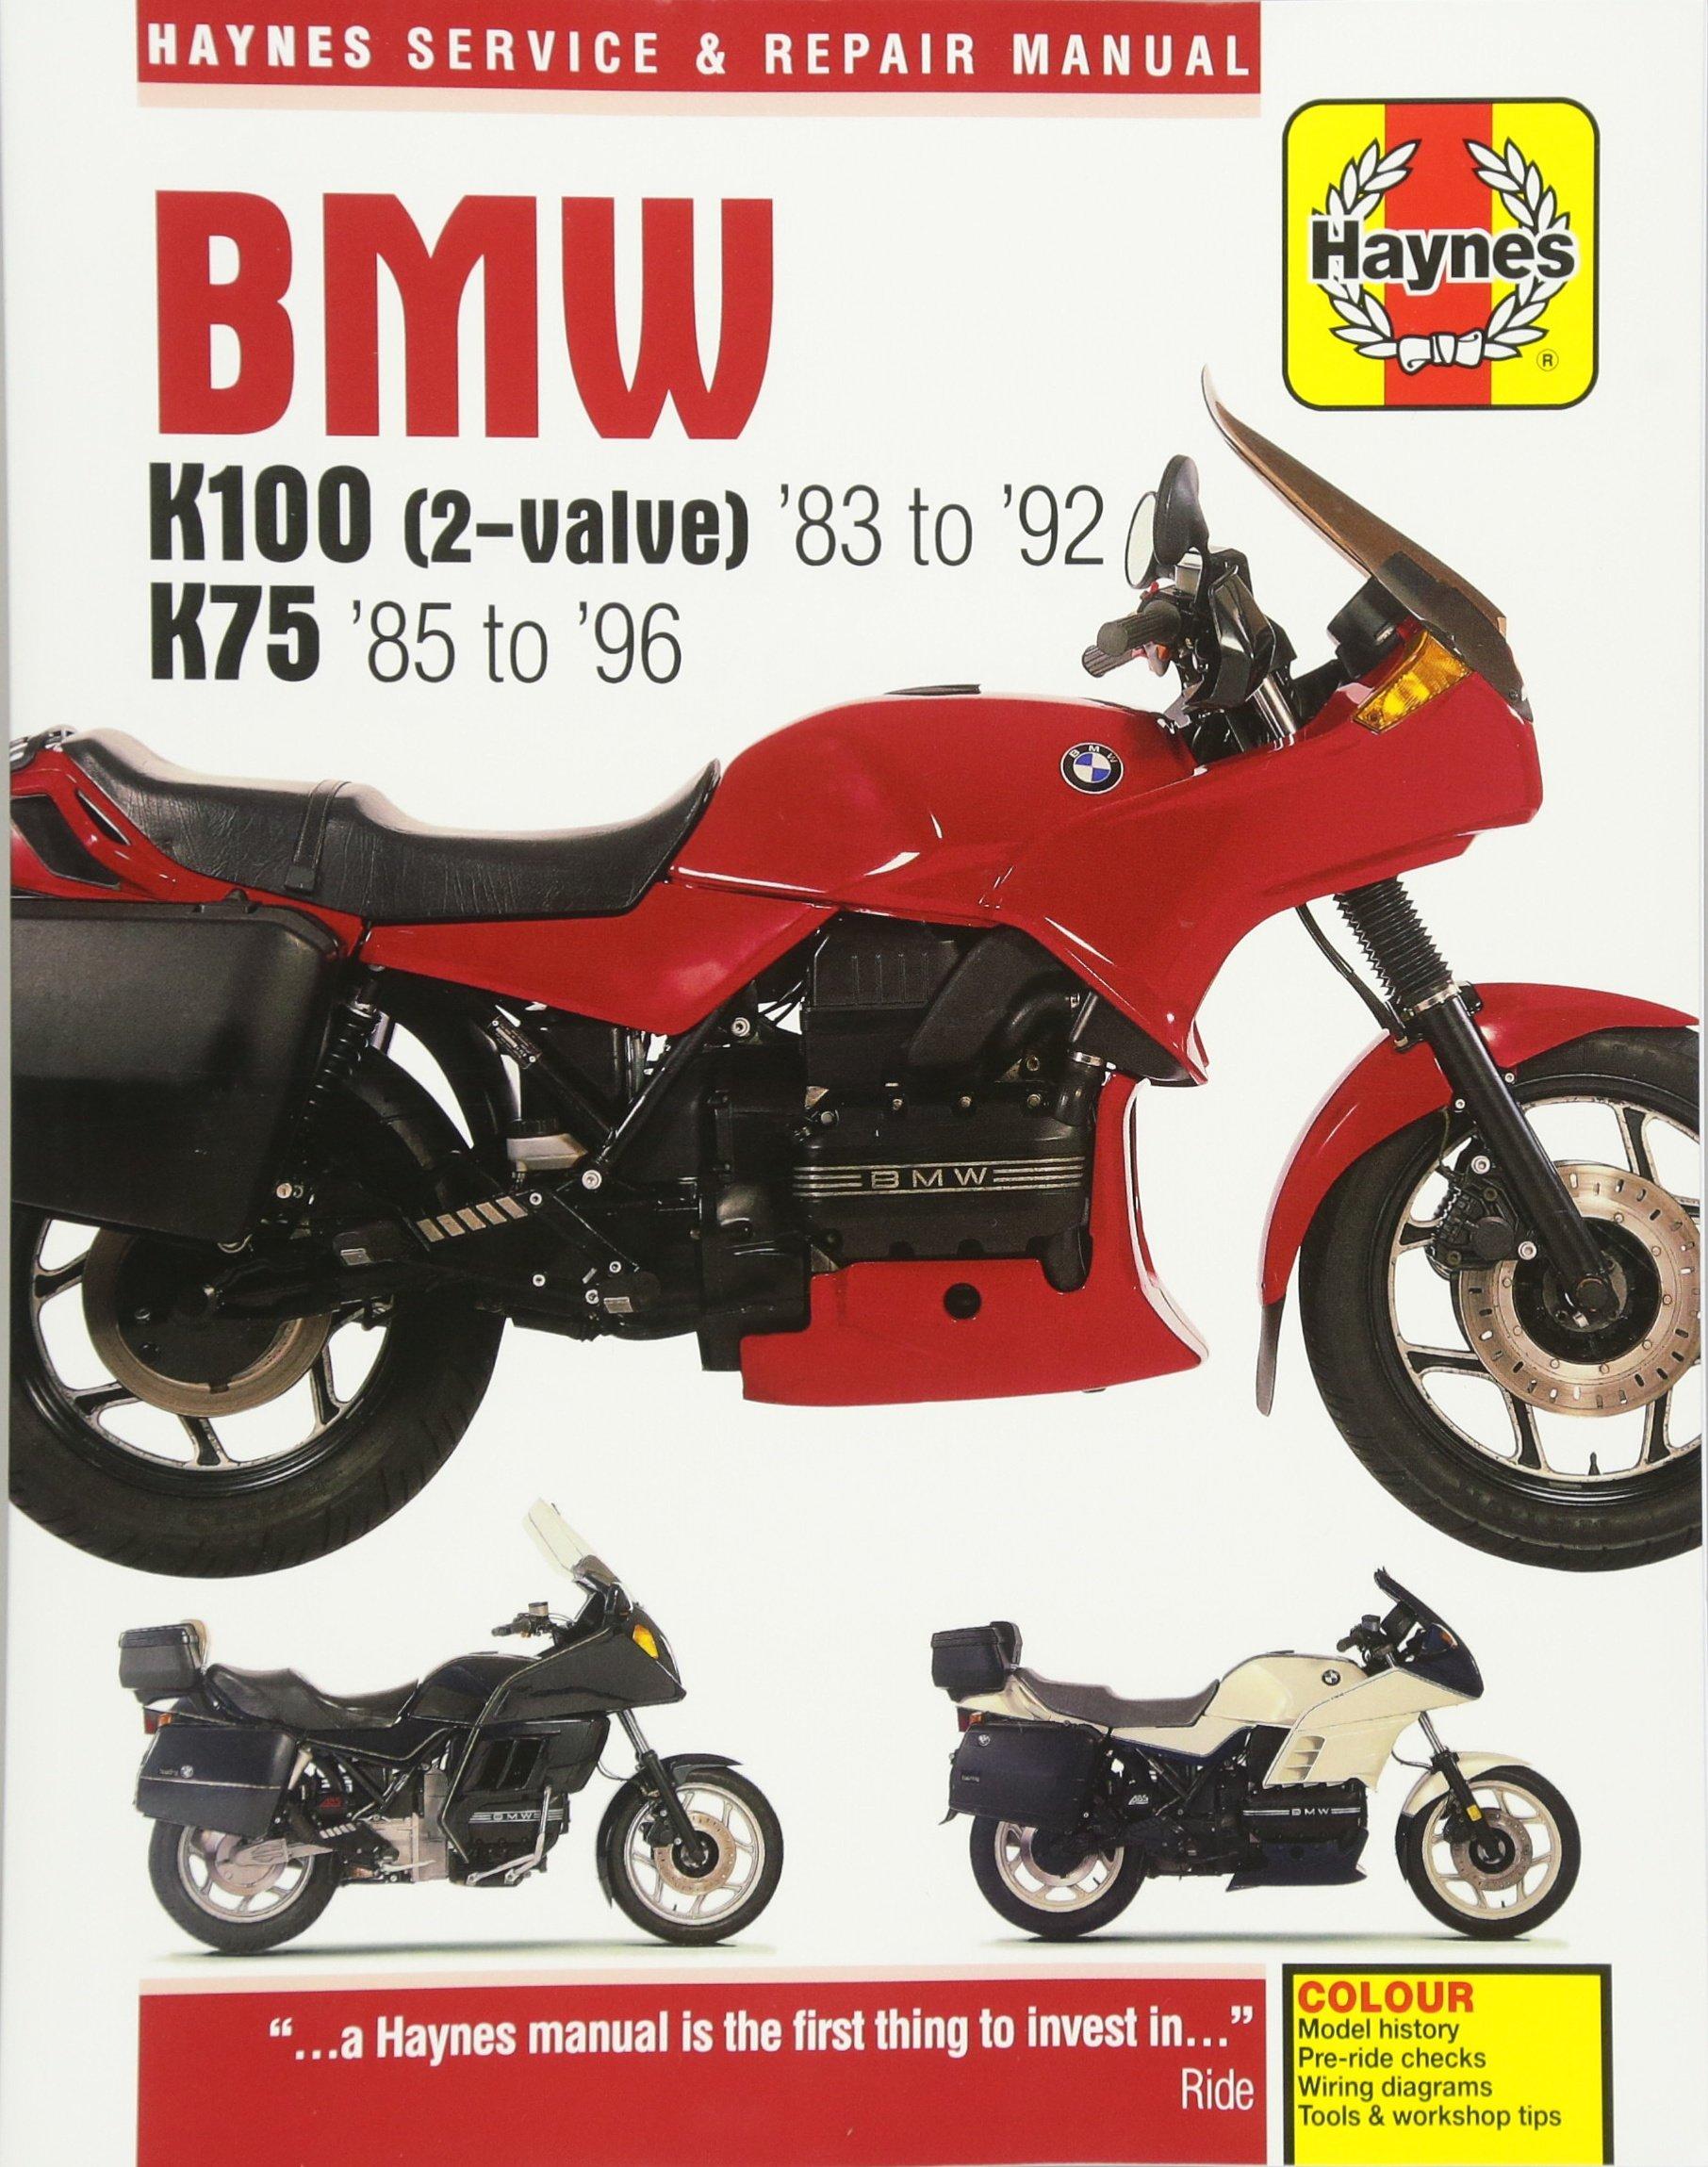 bmw k100 (2 valve) '83 to '92 k75 '85 to '96 (haynes service 1985 bmw r80rt bmw k100 (2 valve) '83 to '92 k75 '85 to '96 (haynes service & repair manual) paperback may 1, 2016